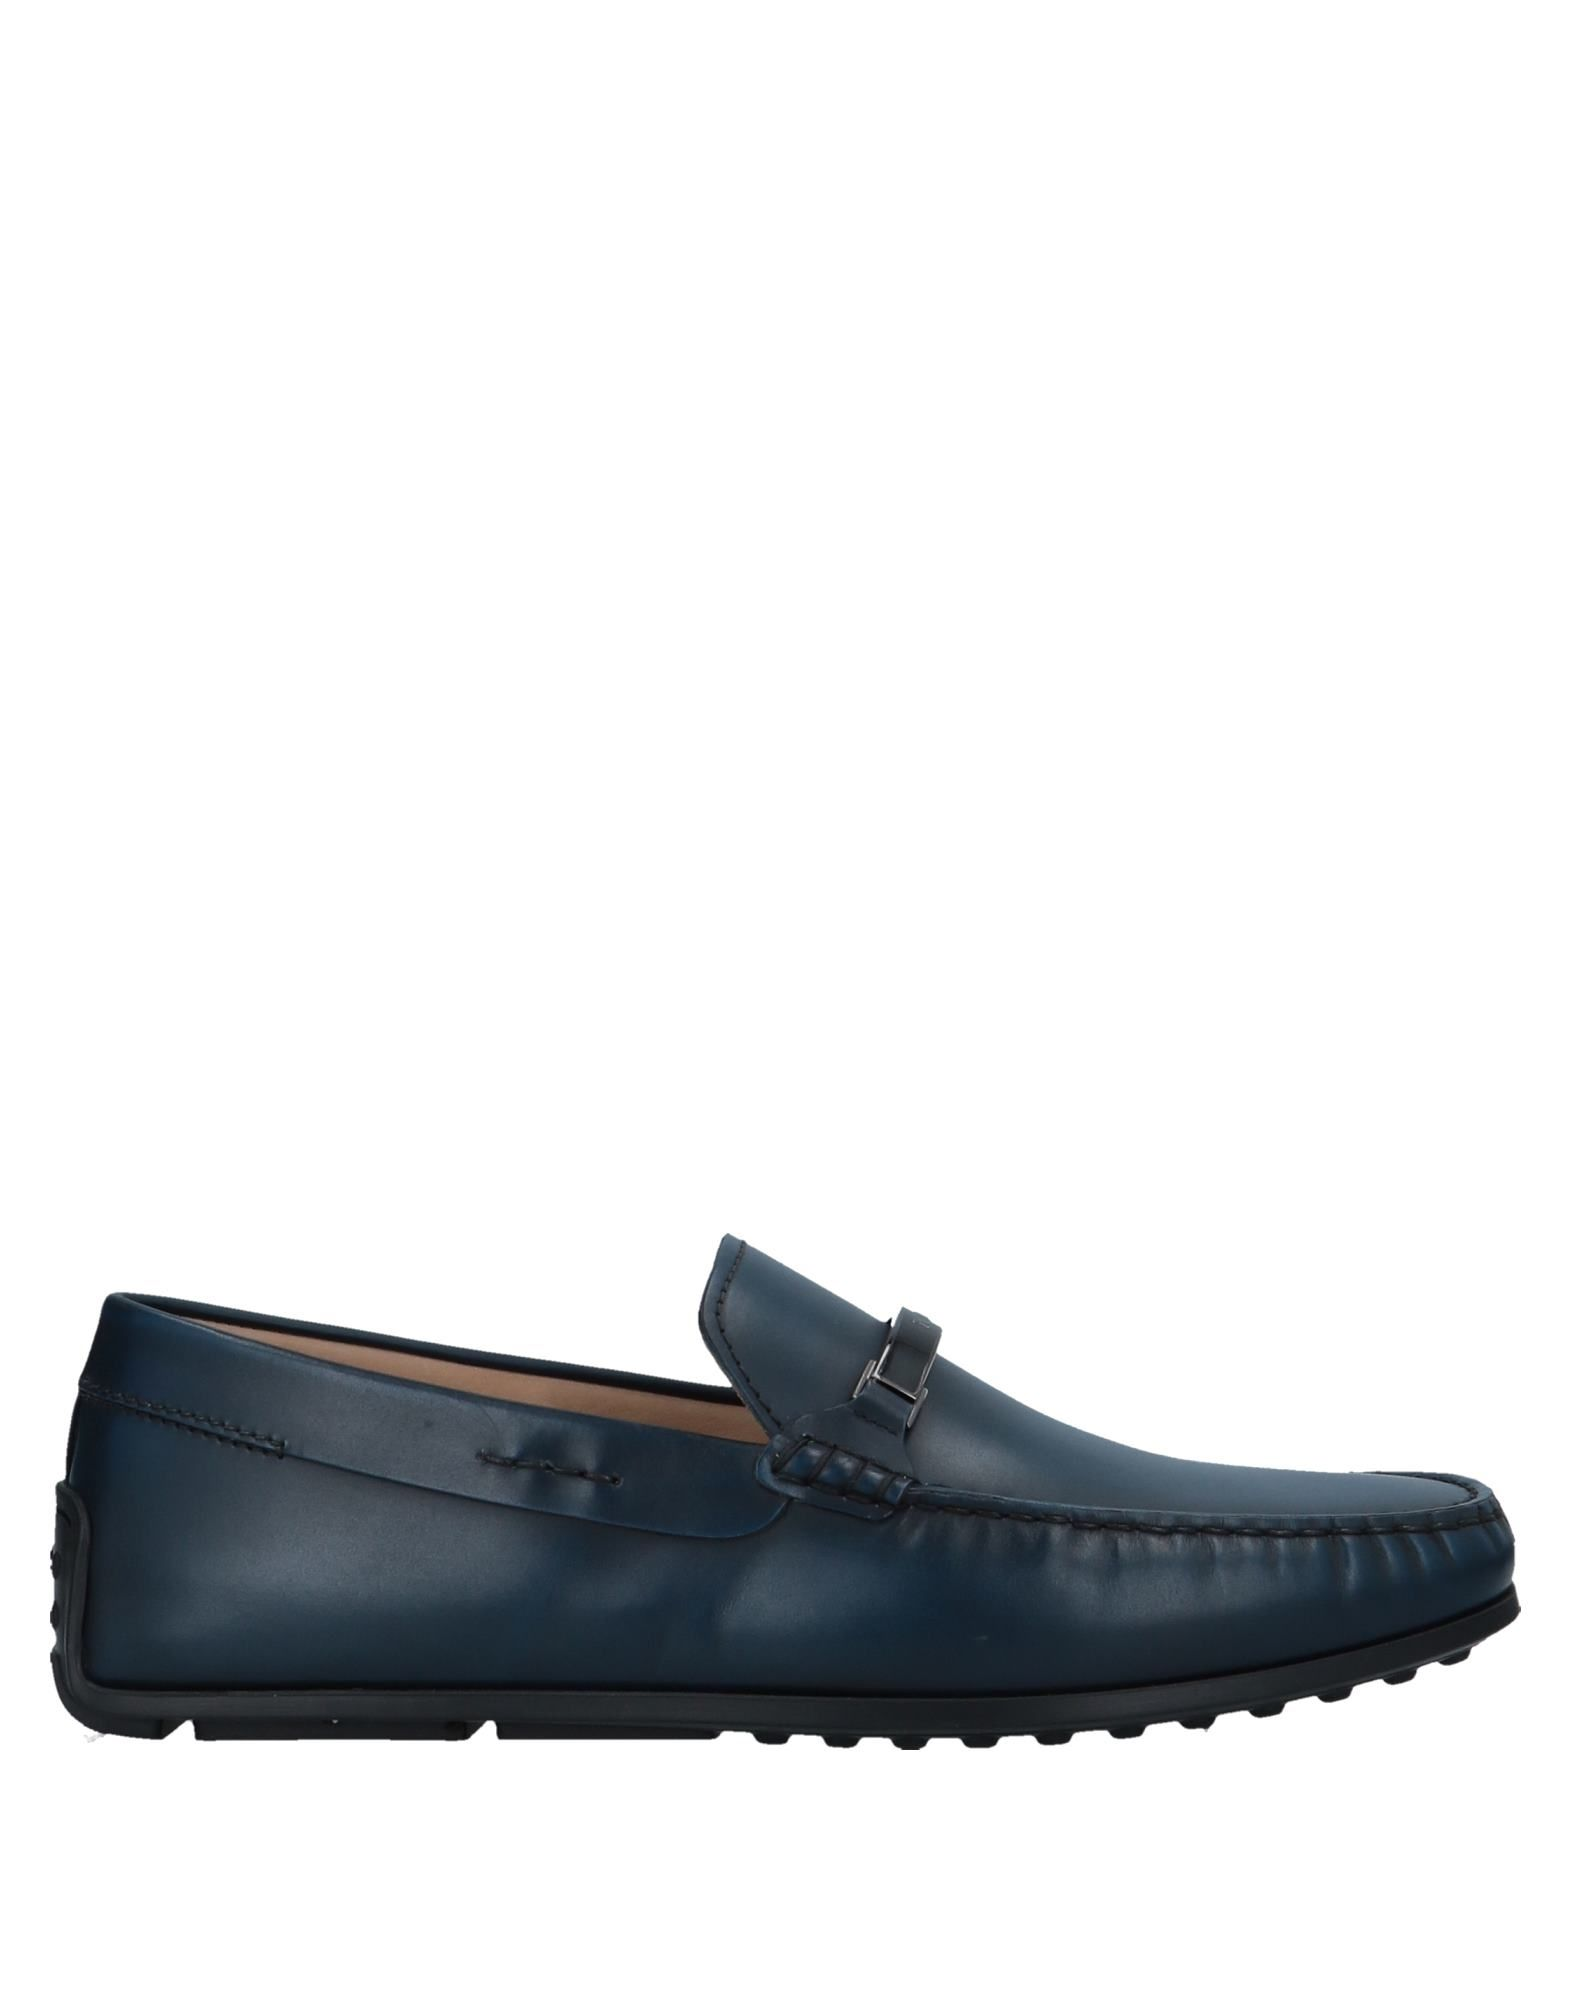 Tod's Mokassins Herren  11472380VH Gute Qualität beliebte Schuhe